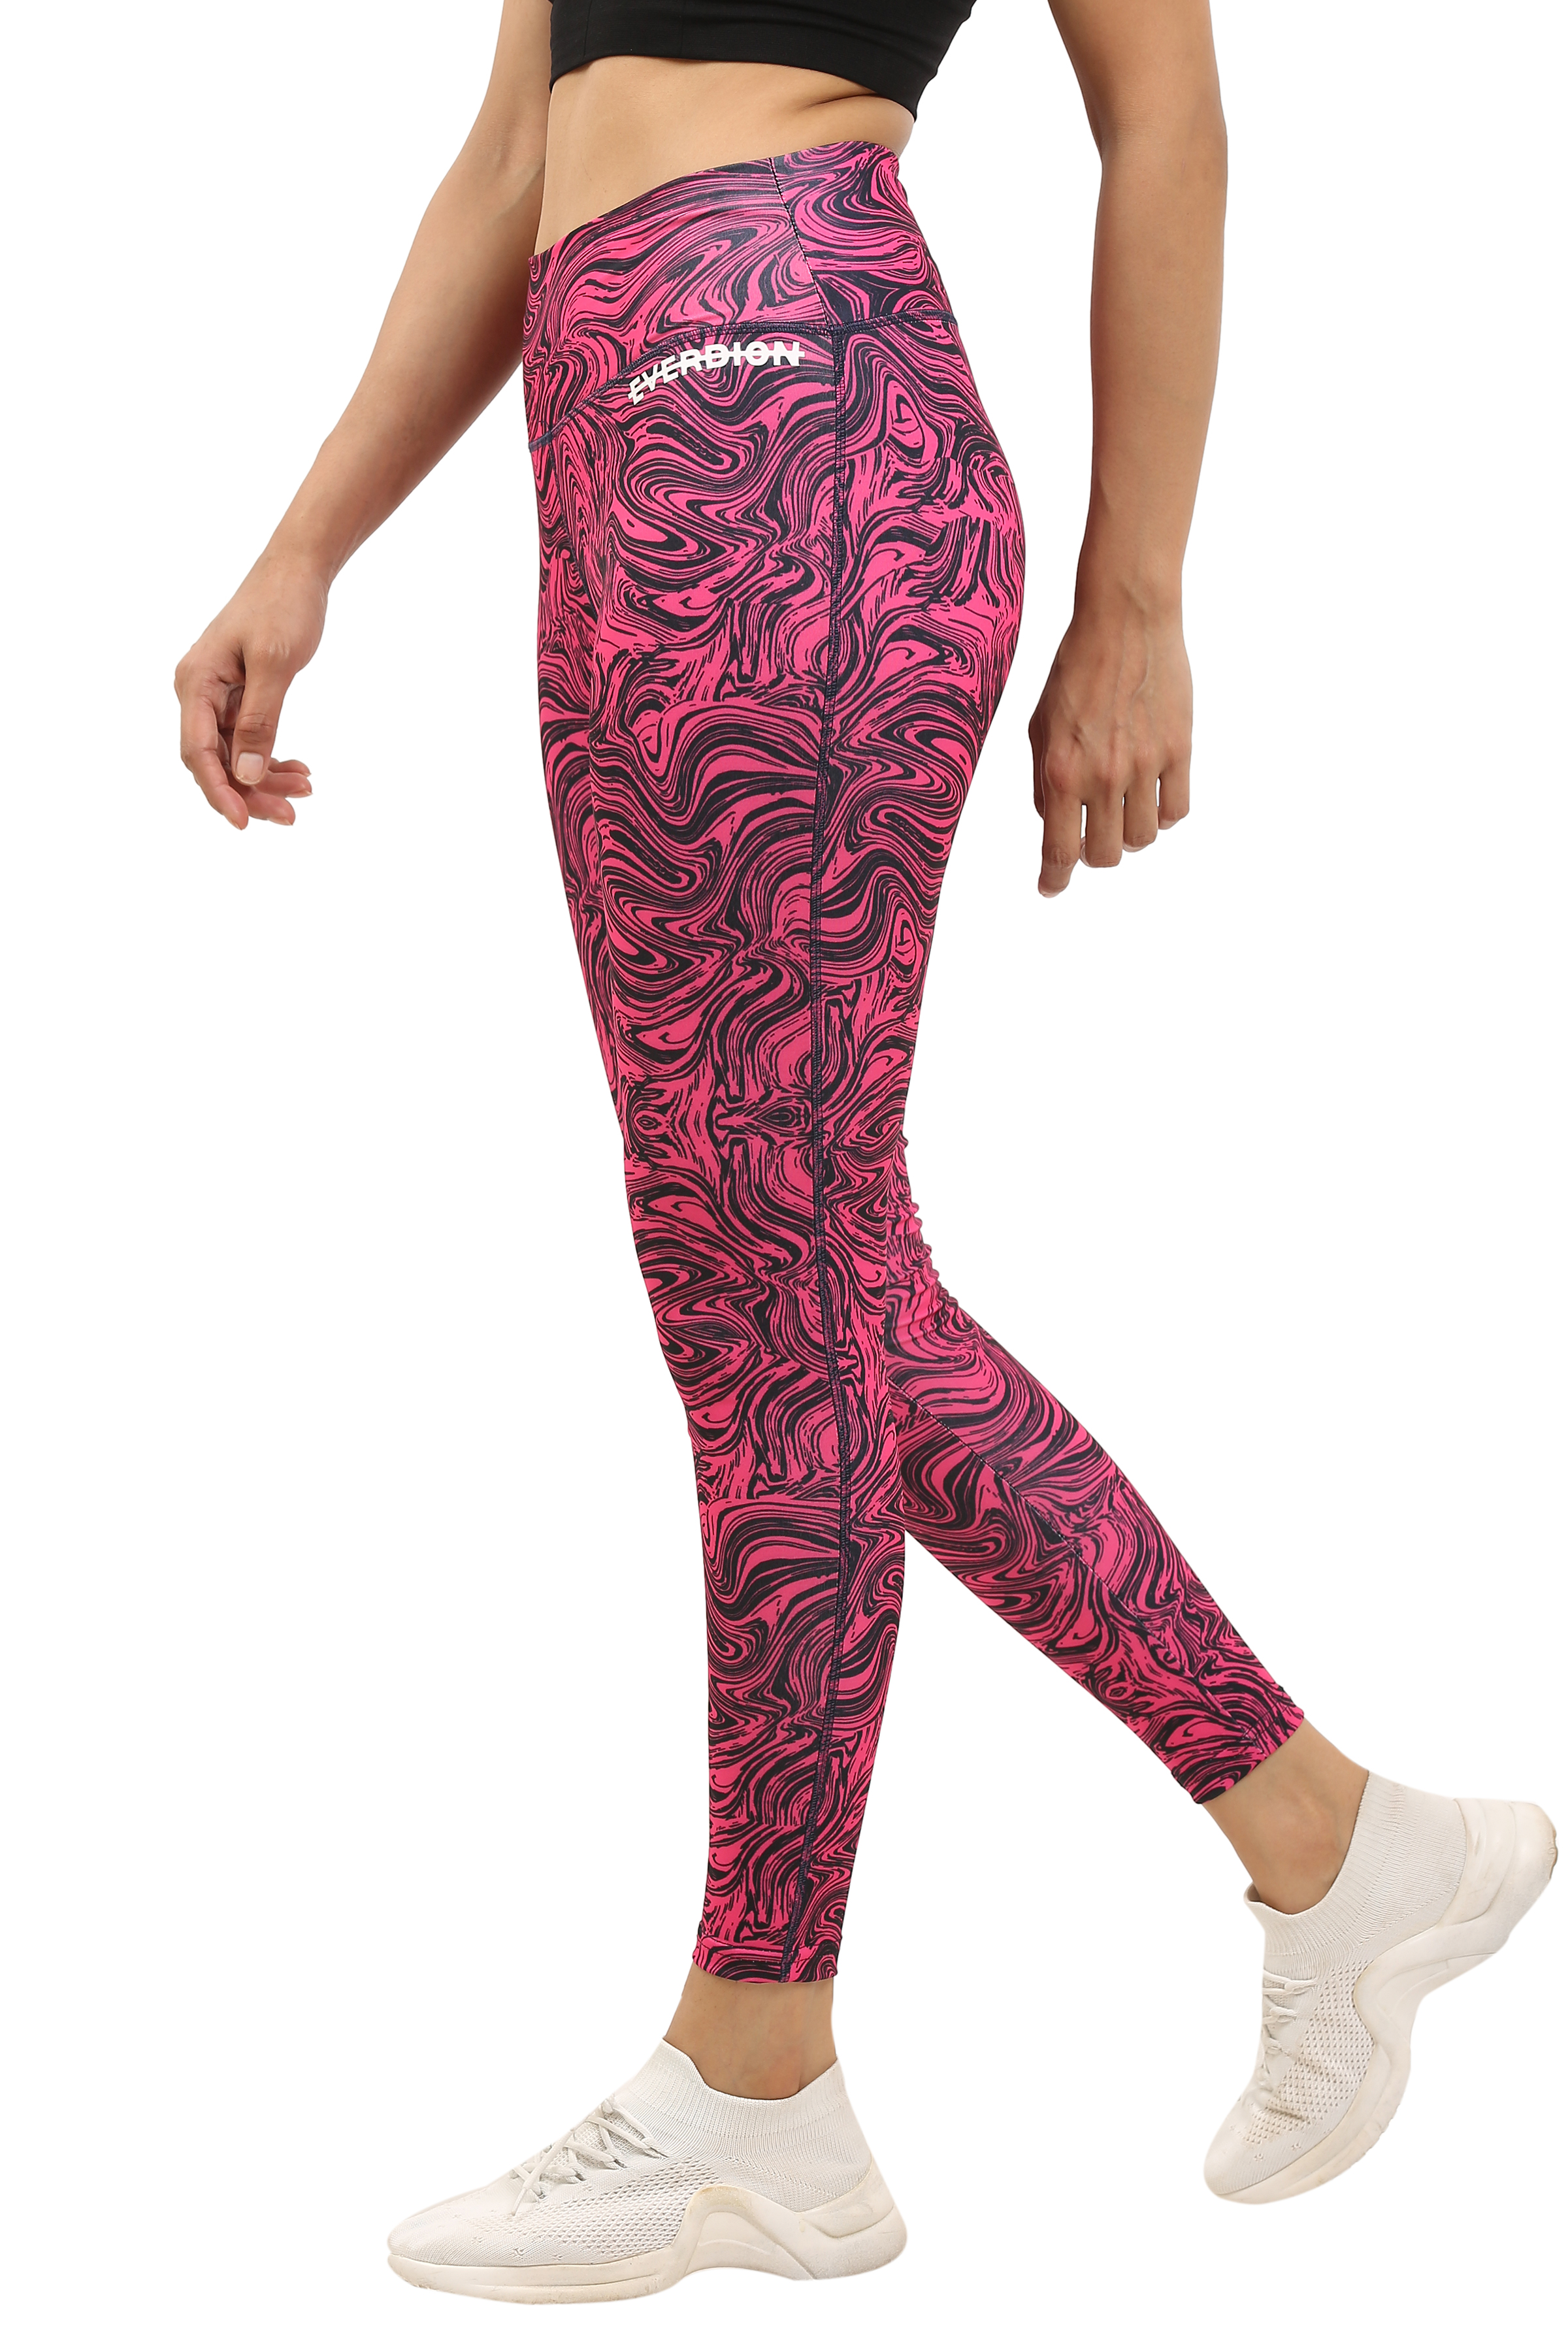 EVERDION | Pink Sports Leggings